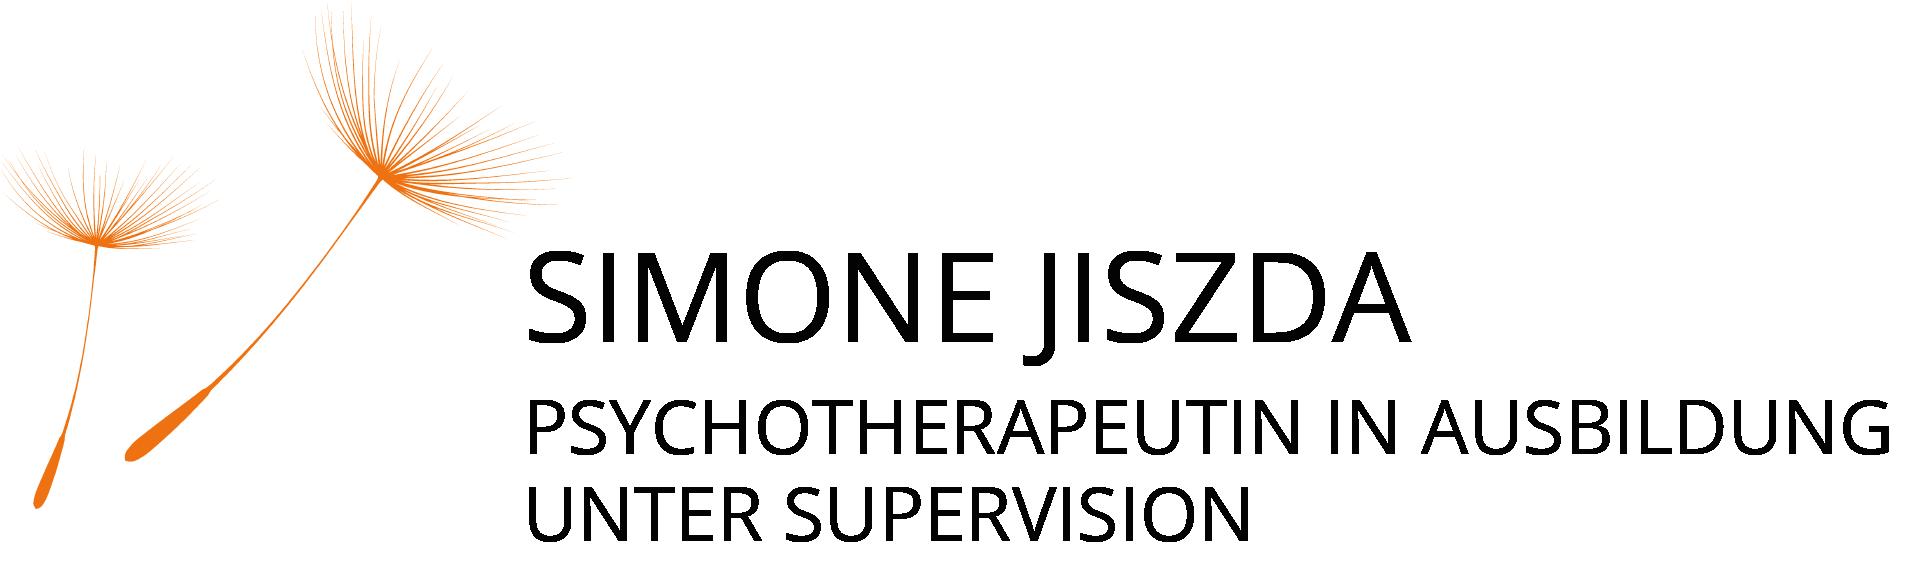 Simone Jiszda Psychotherapie